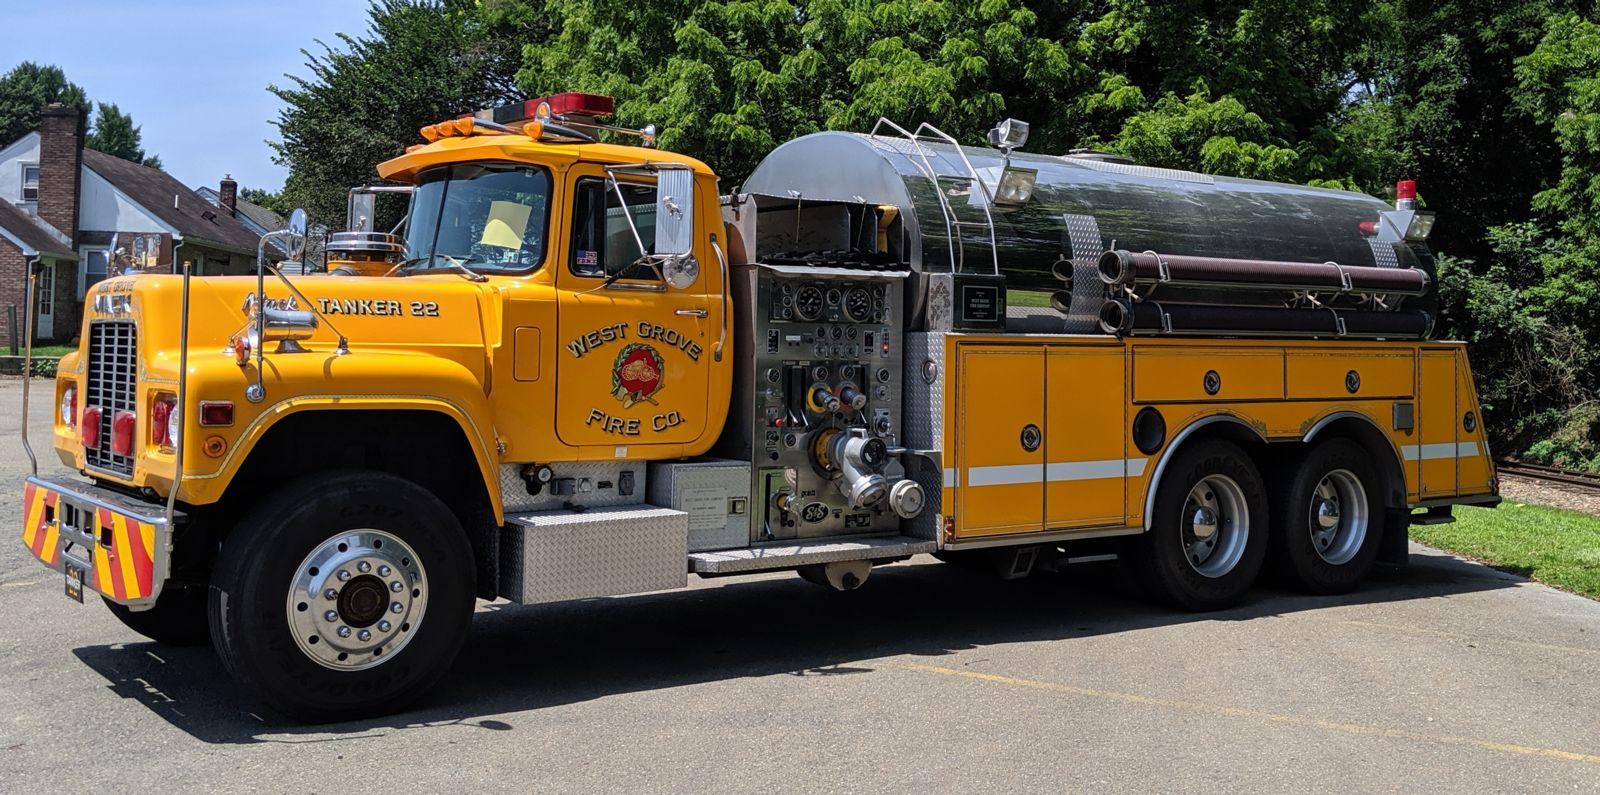 West Grove Fire Company - Chester County, Pennsylvania